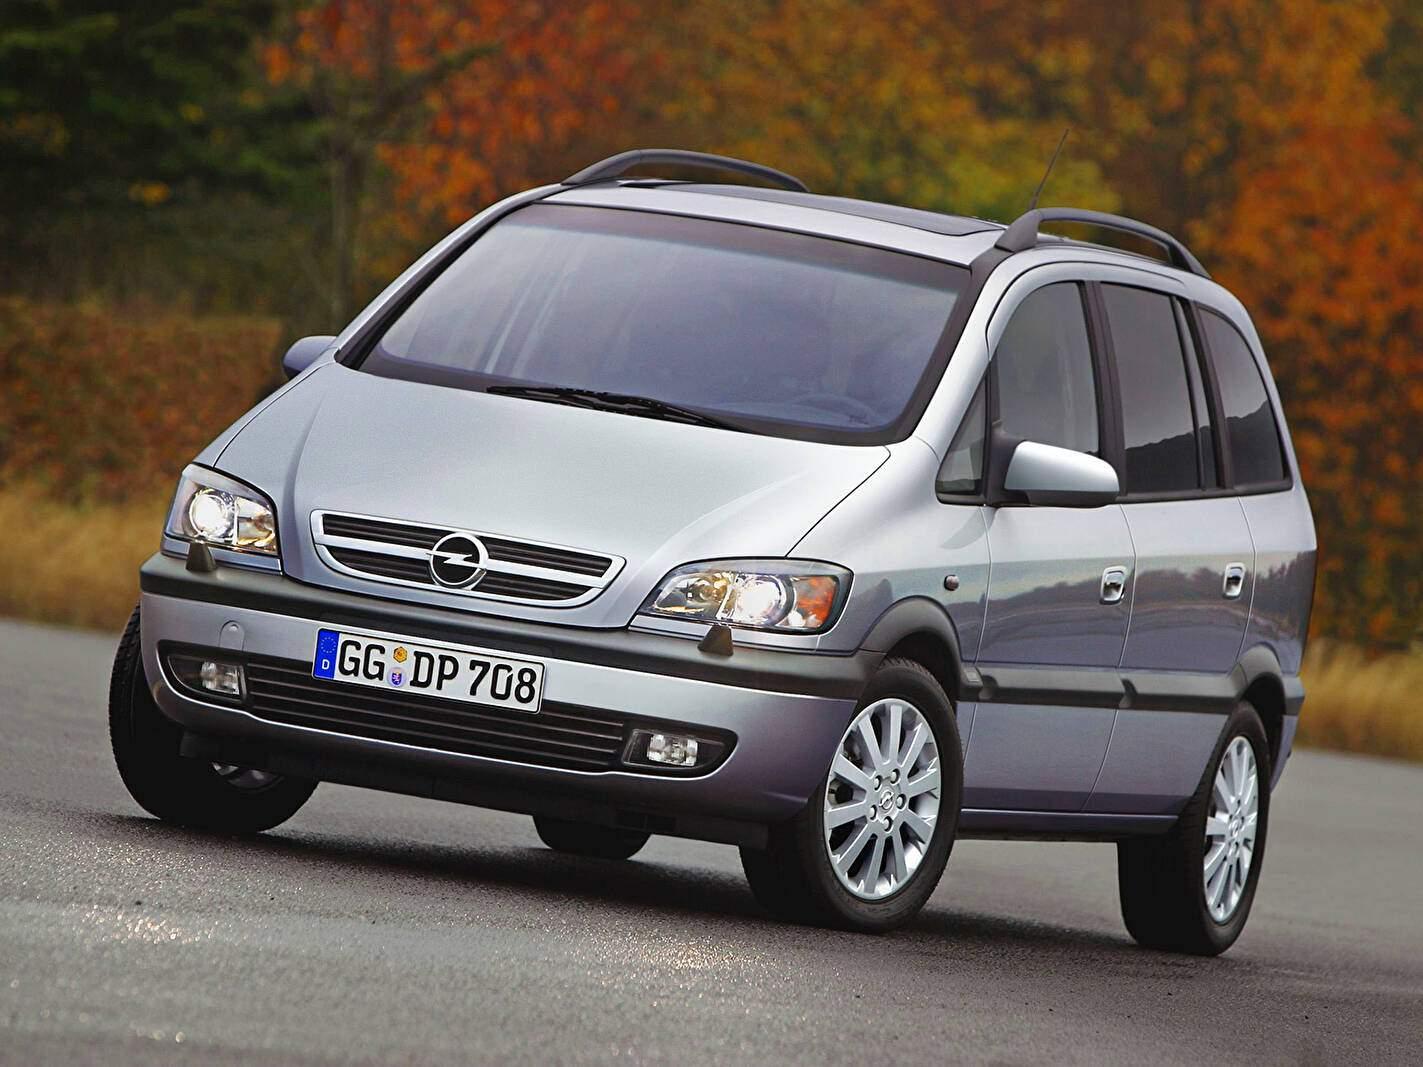 Opel Zafira 2.2 DTI 125 (2001-2005),  ajouté par fox58